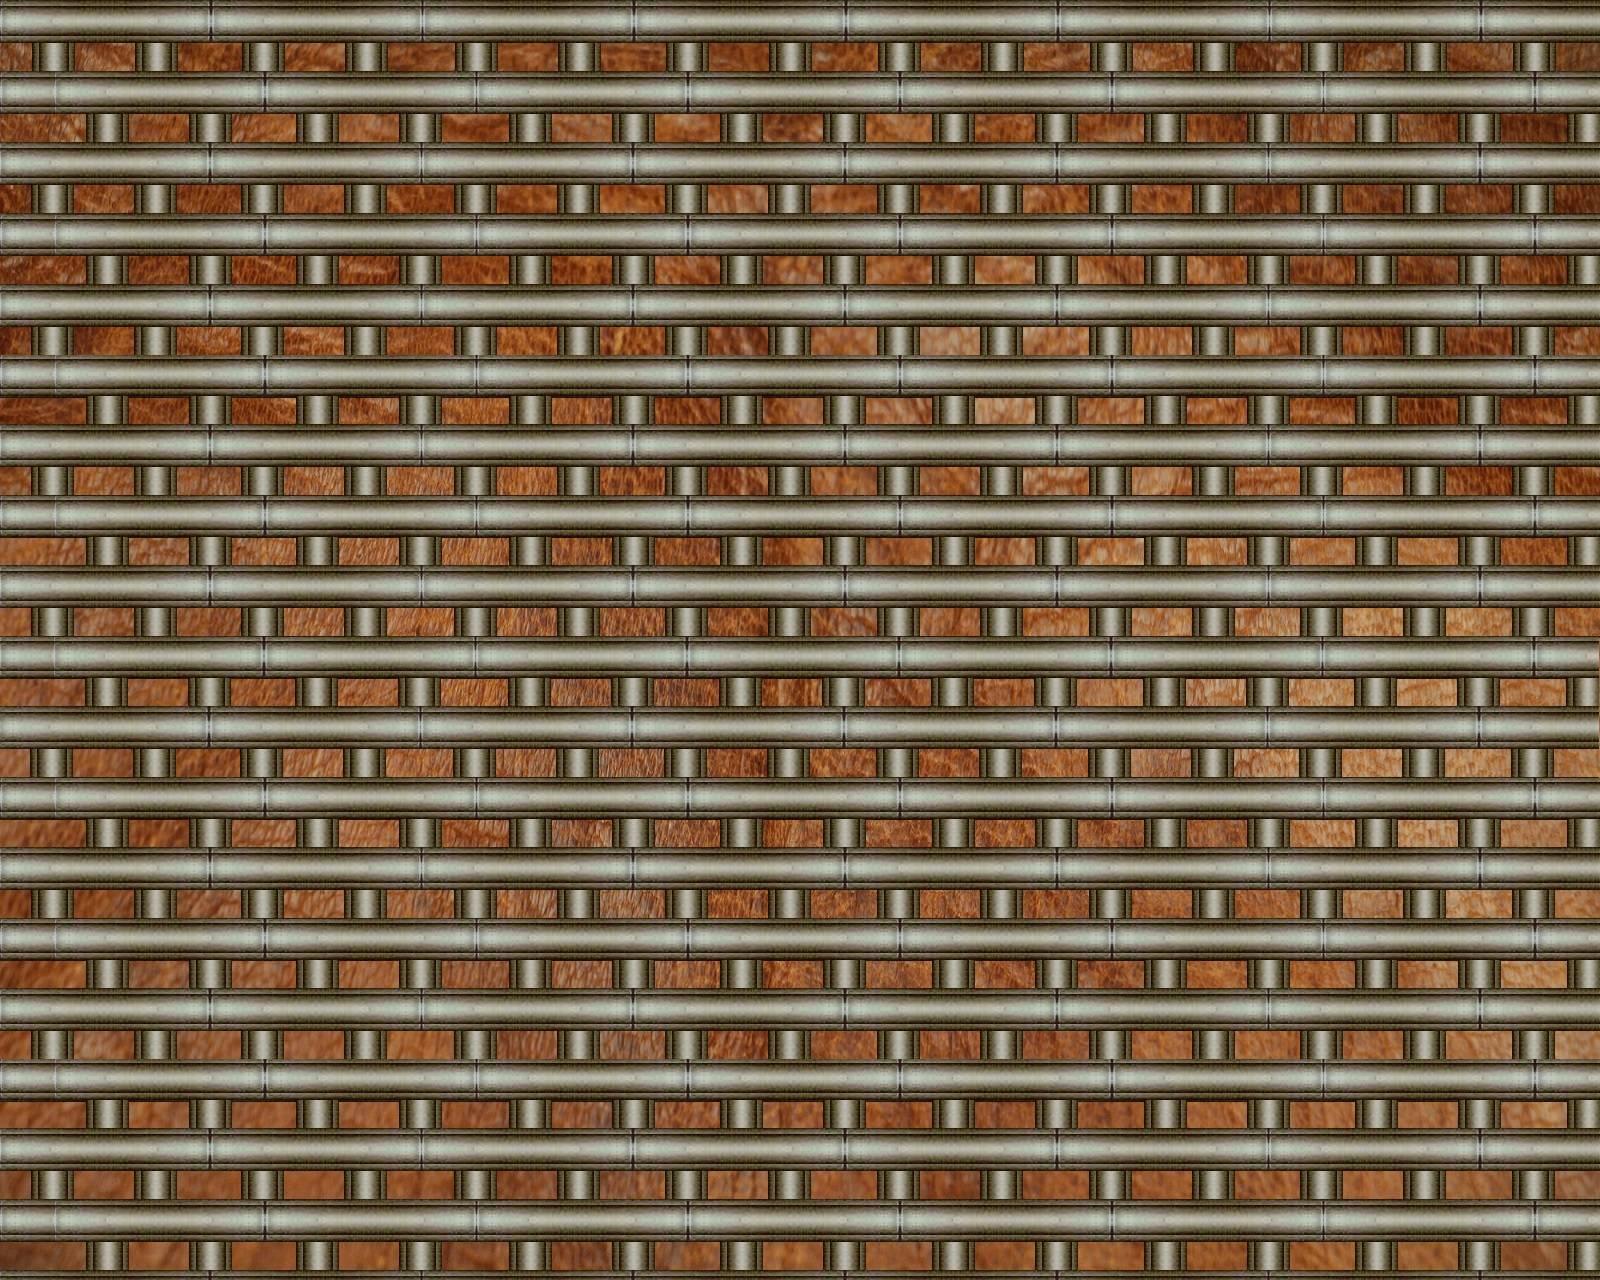 Brick Patterns 8